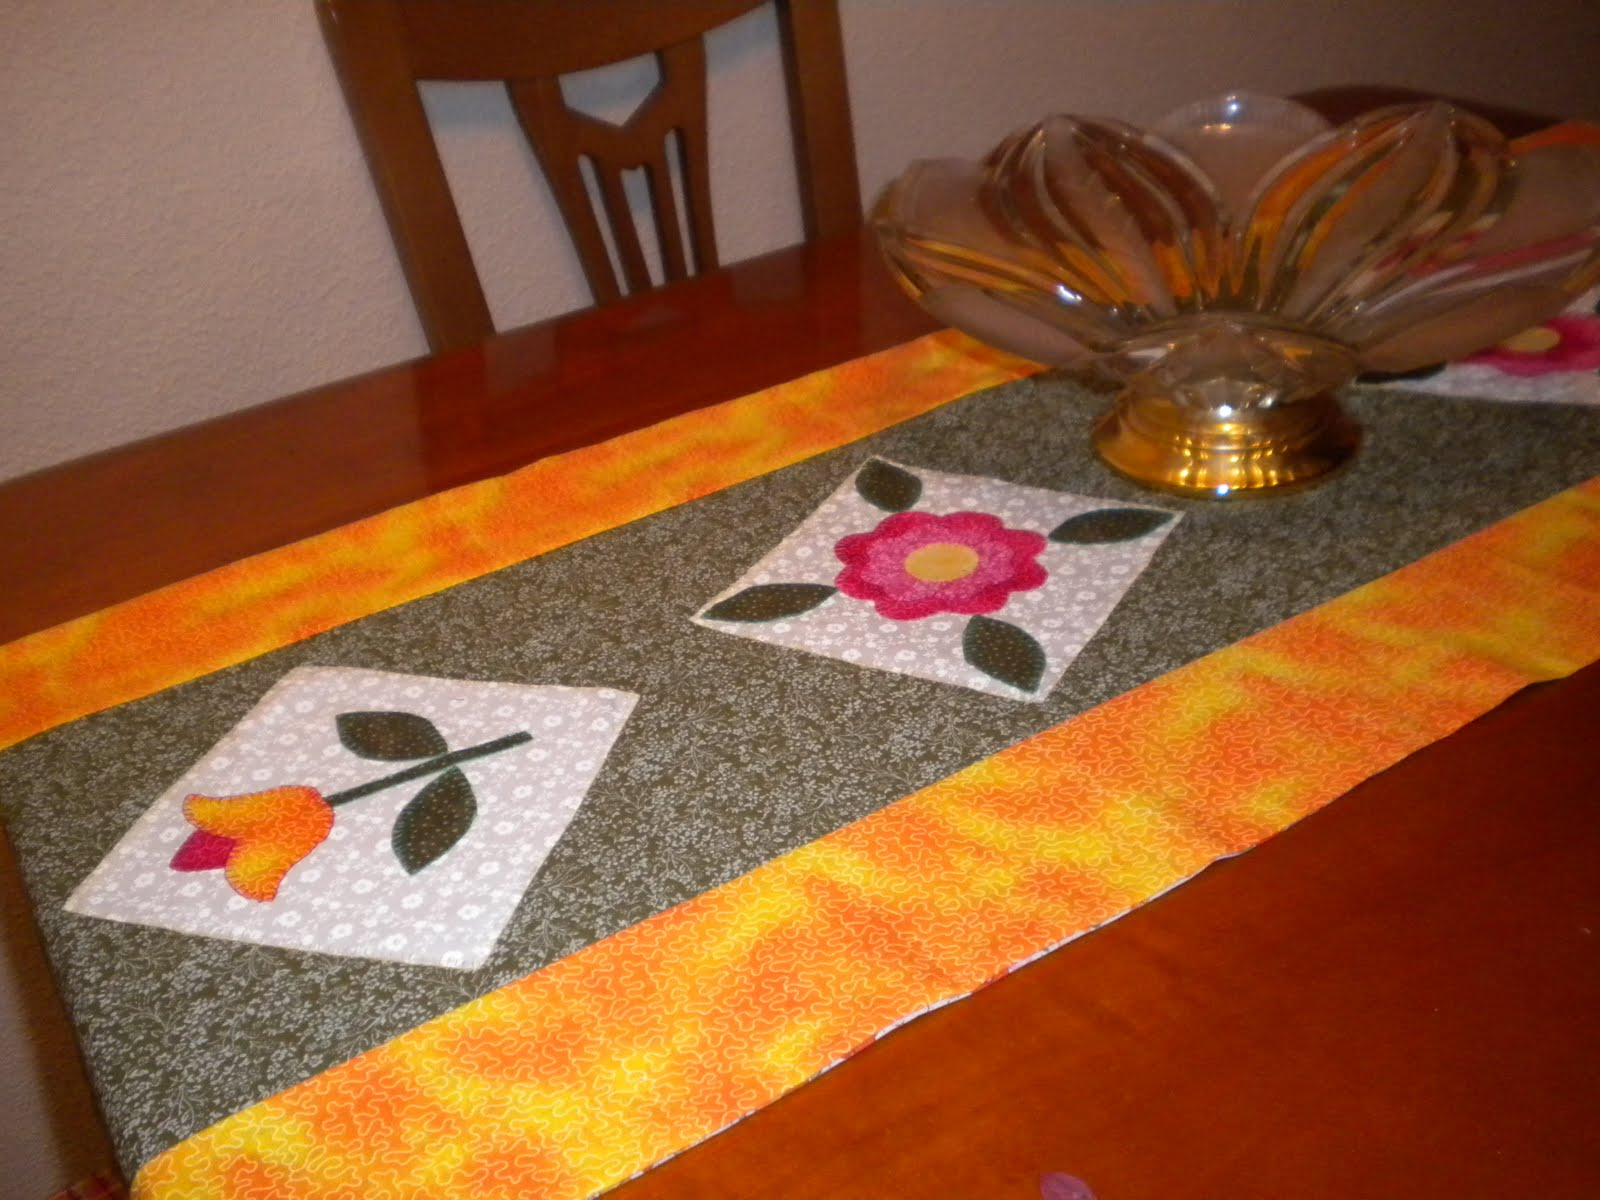 Camino de mesa de patchwork el blog de margarita el - Camino mesa patchwork ...